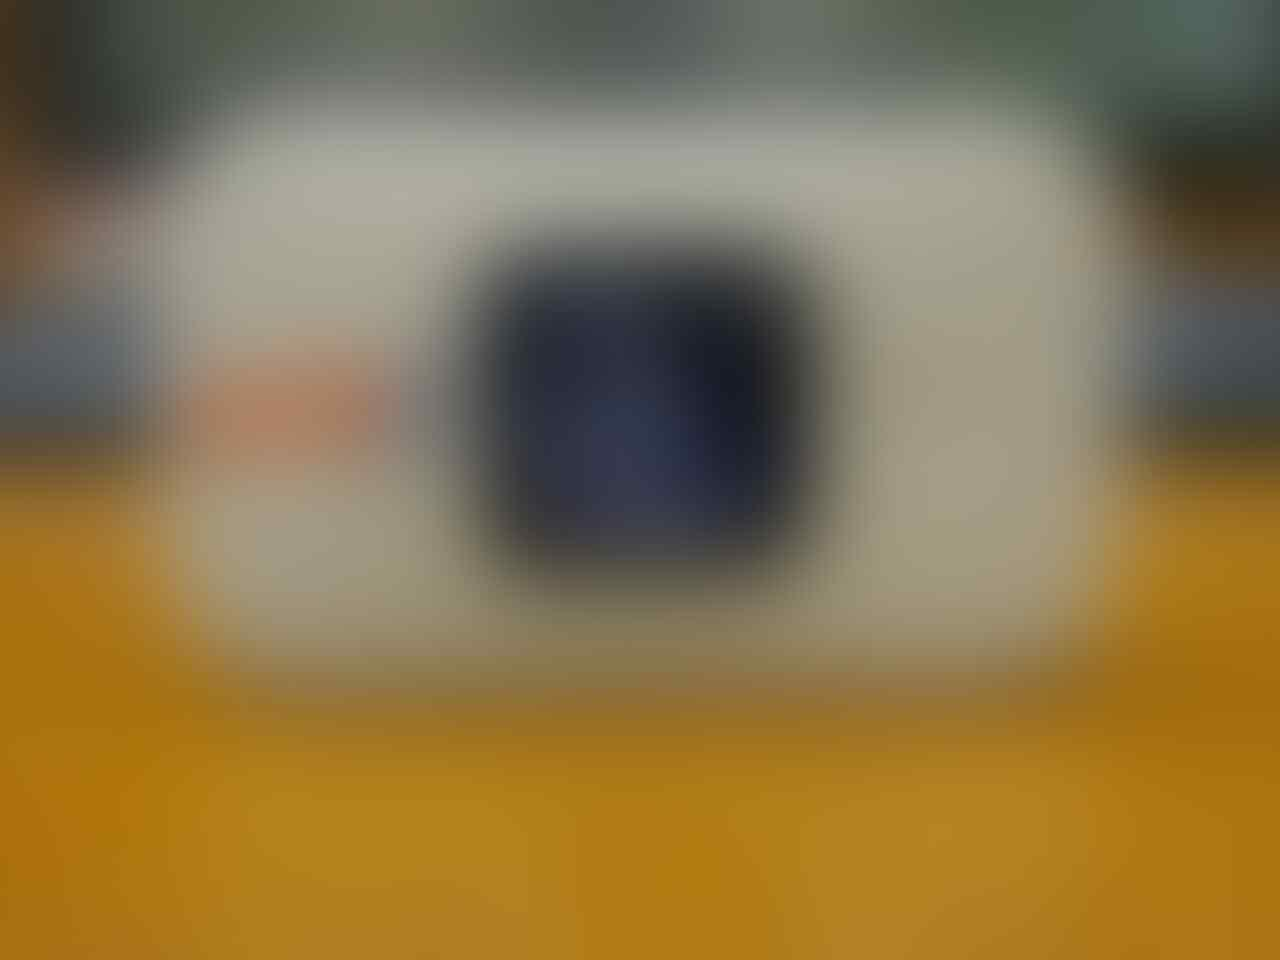 Jasa UNLOCK ALL 4G mifi bolt E5577 (Slim2 & Max2) via Remote Online/Kirim